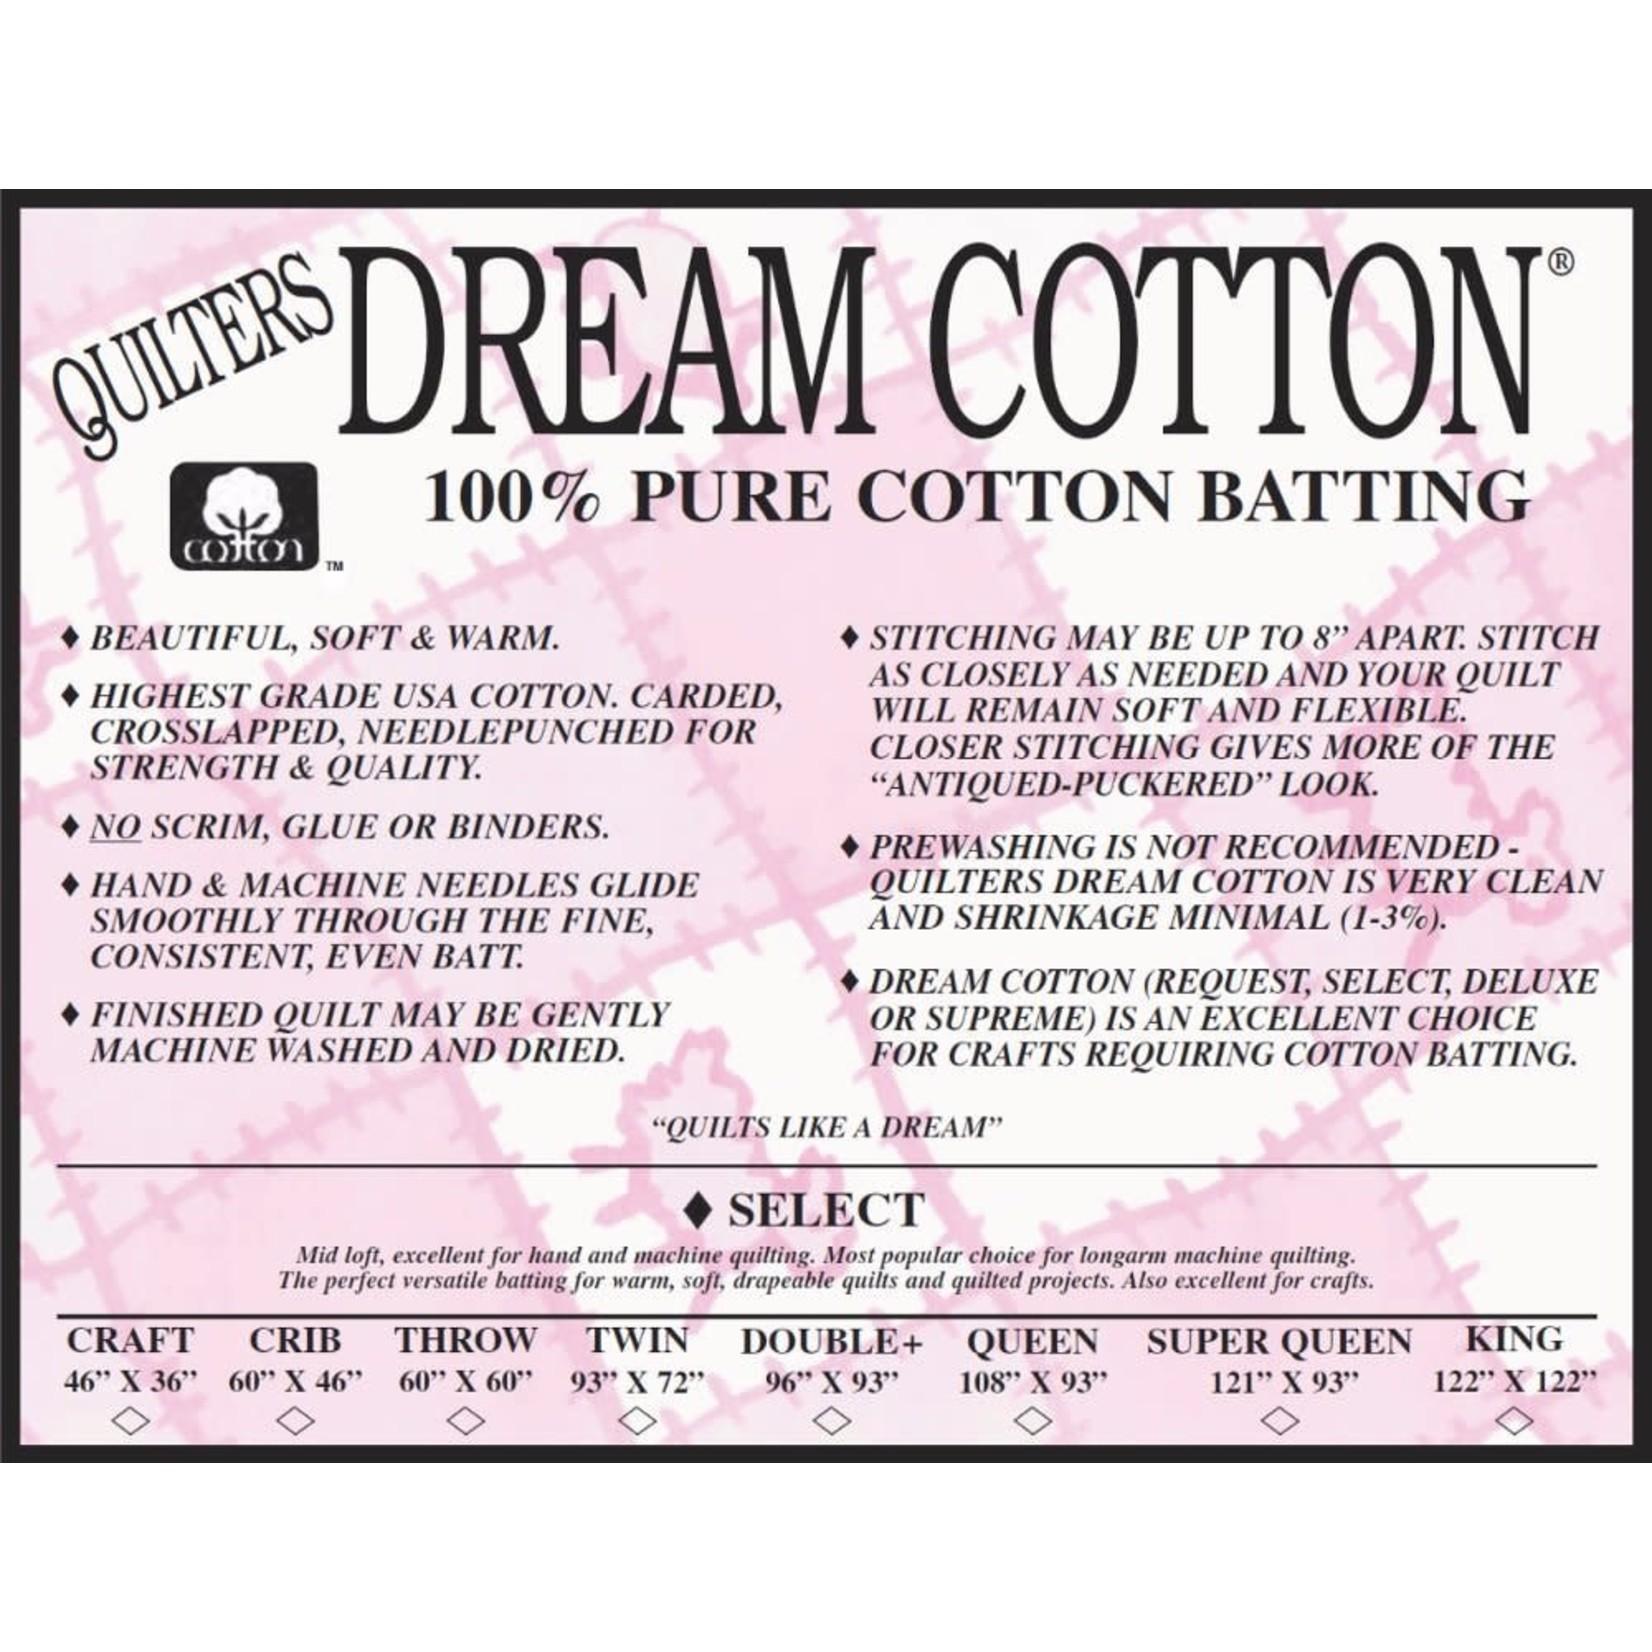 DREAM COTTON DREAM COTTON SELECT SUPER QUEEN NATURAL BATTING